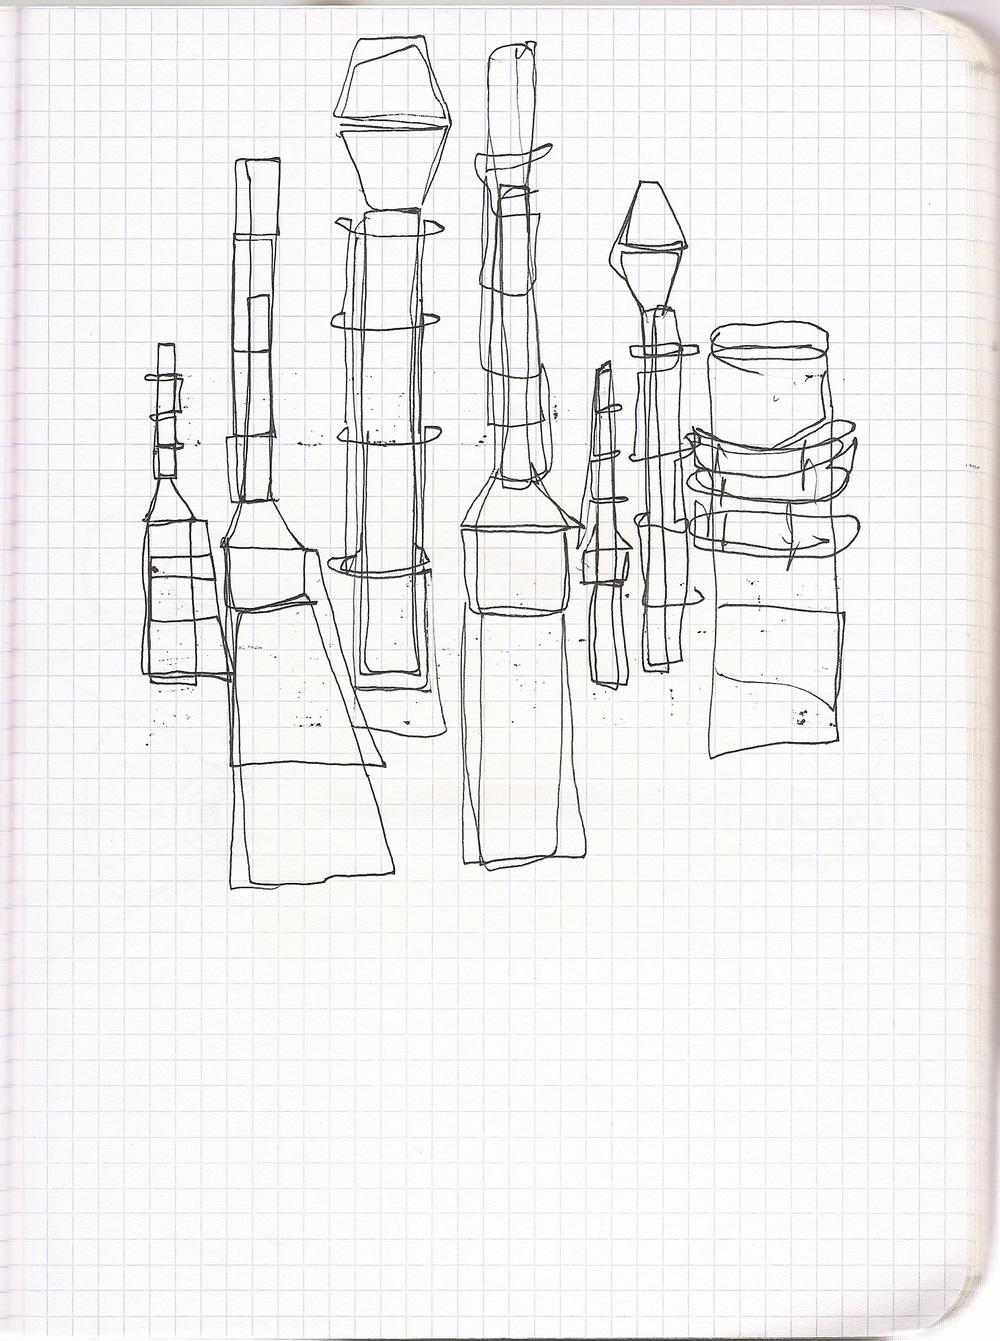 drawing_2.jpg